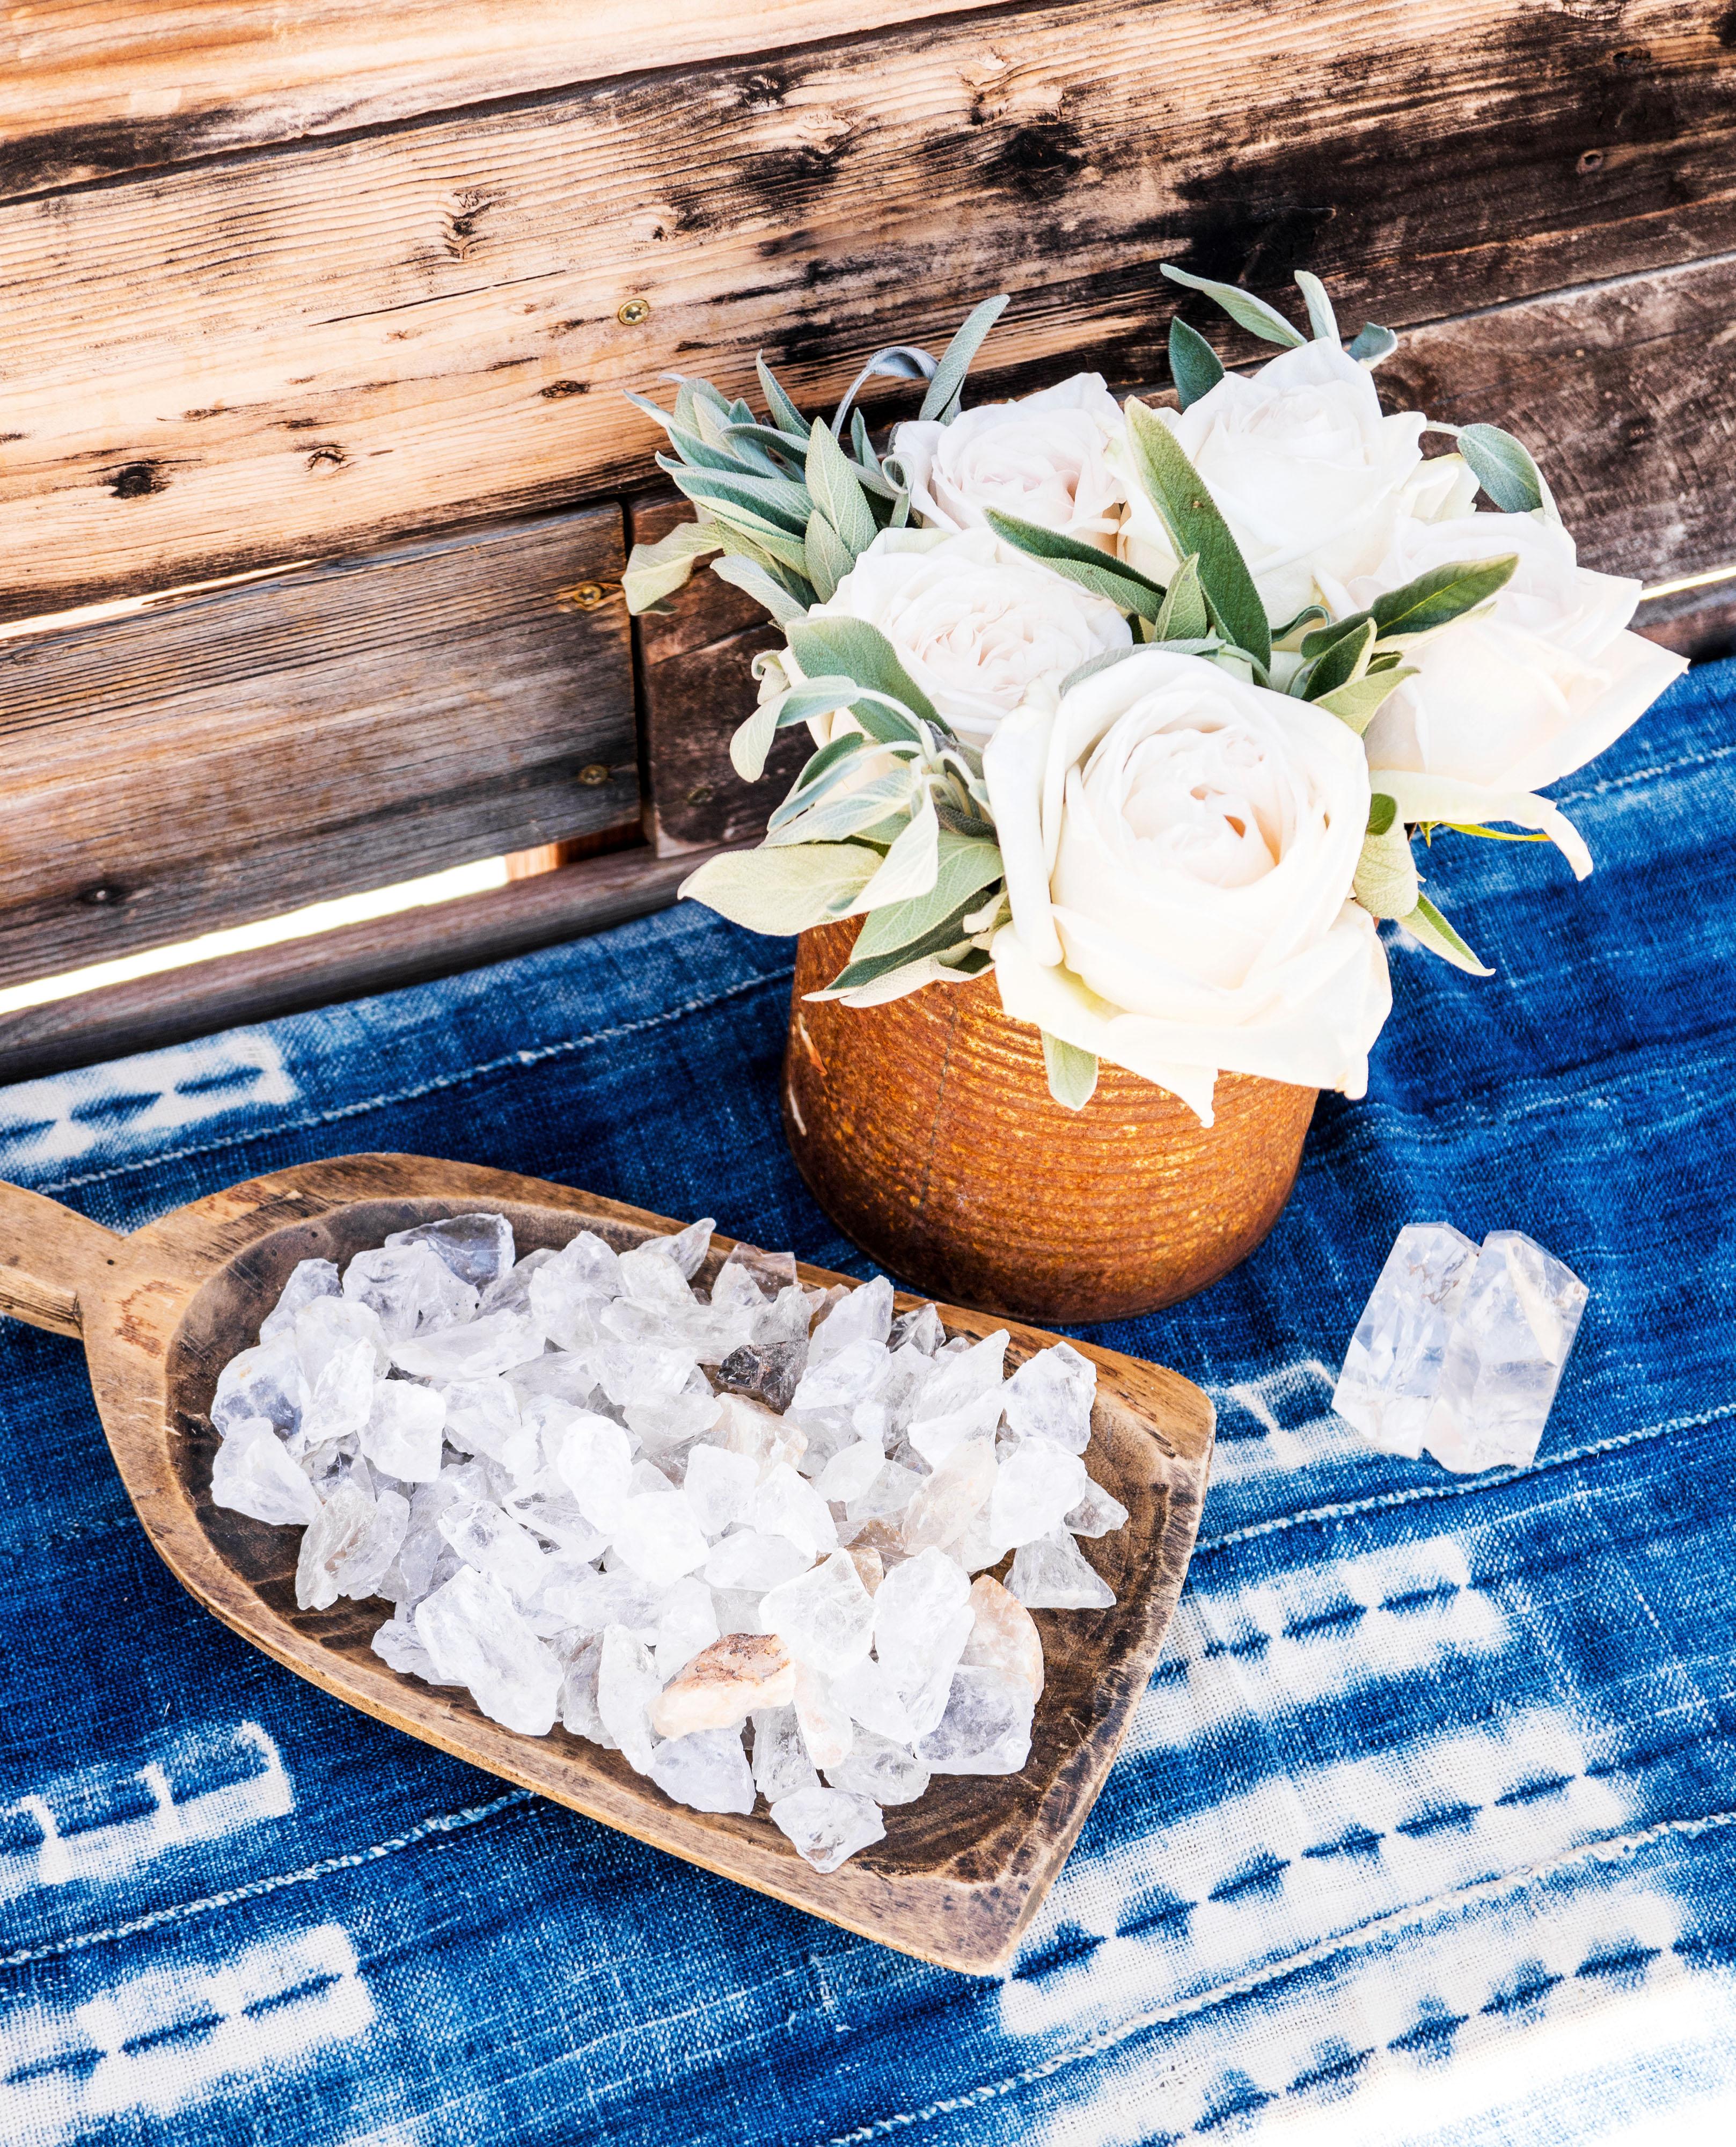 crystal energy table blue white flowers